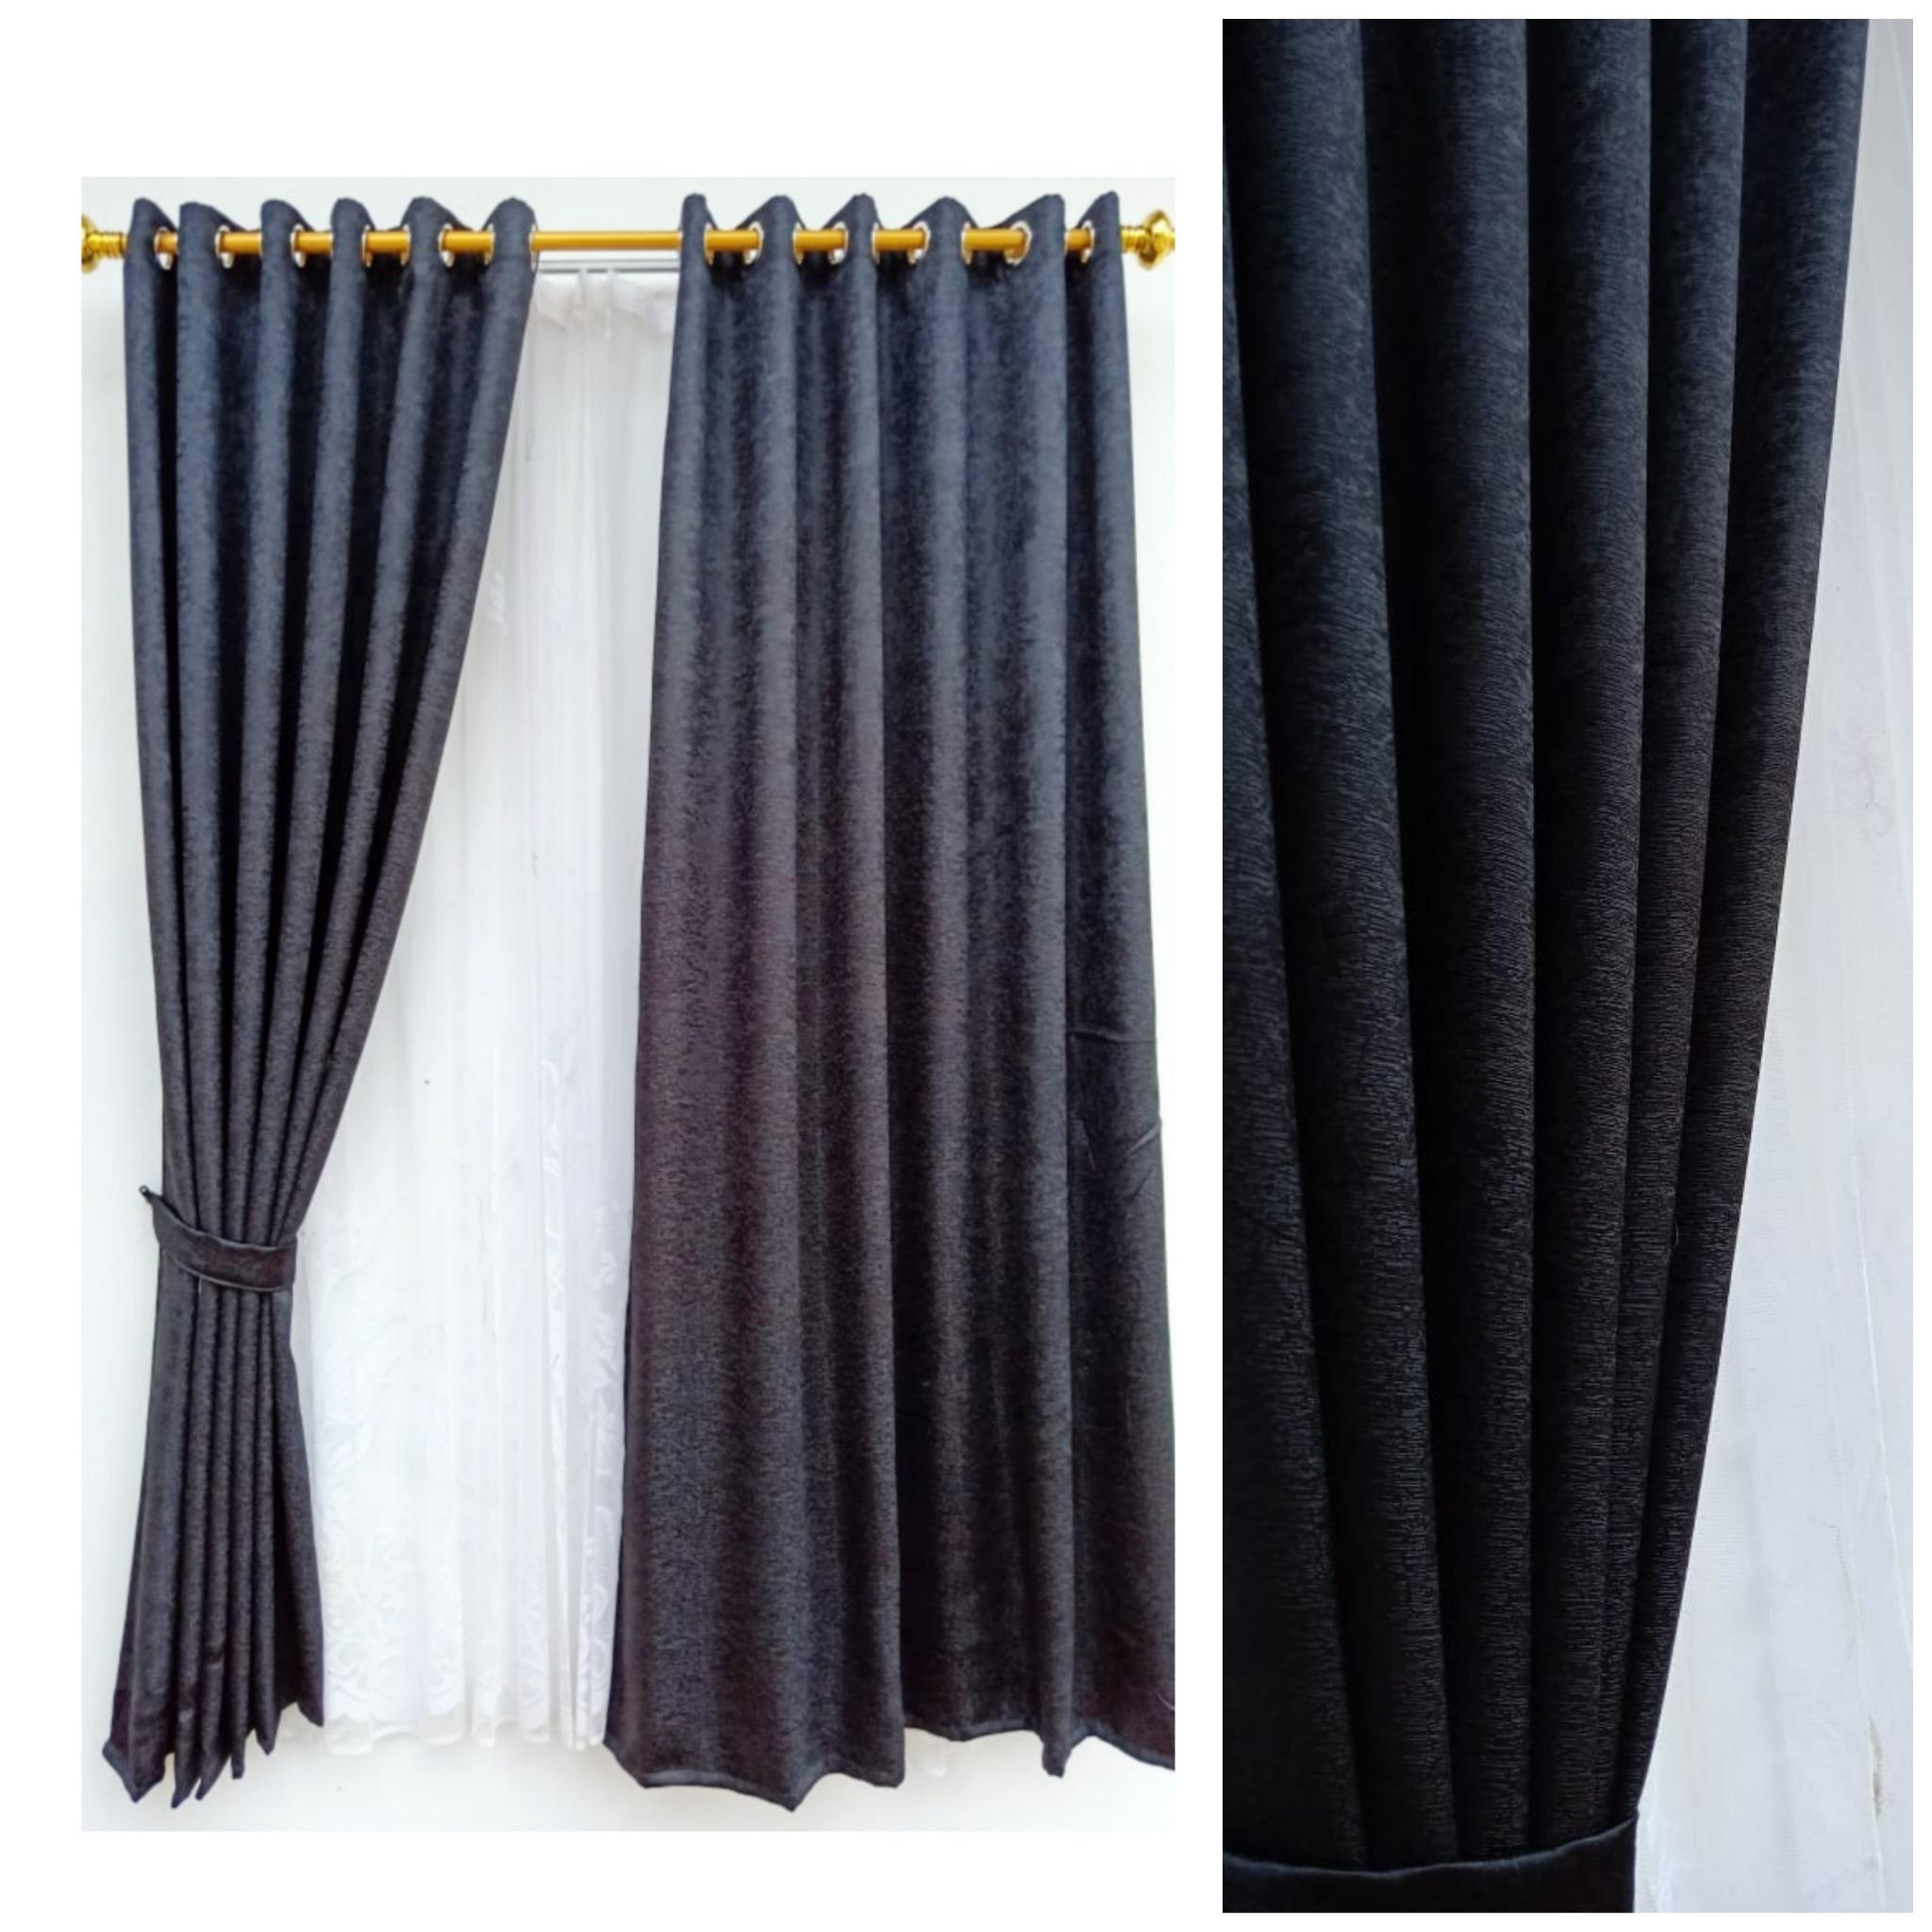 Gorden blackout serat hitam tirai jendela pintu minimalis murah dekorasi rumah mewah import terbaru